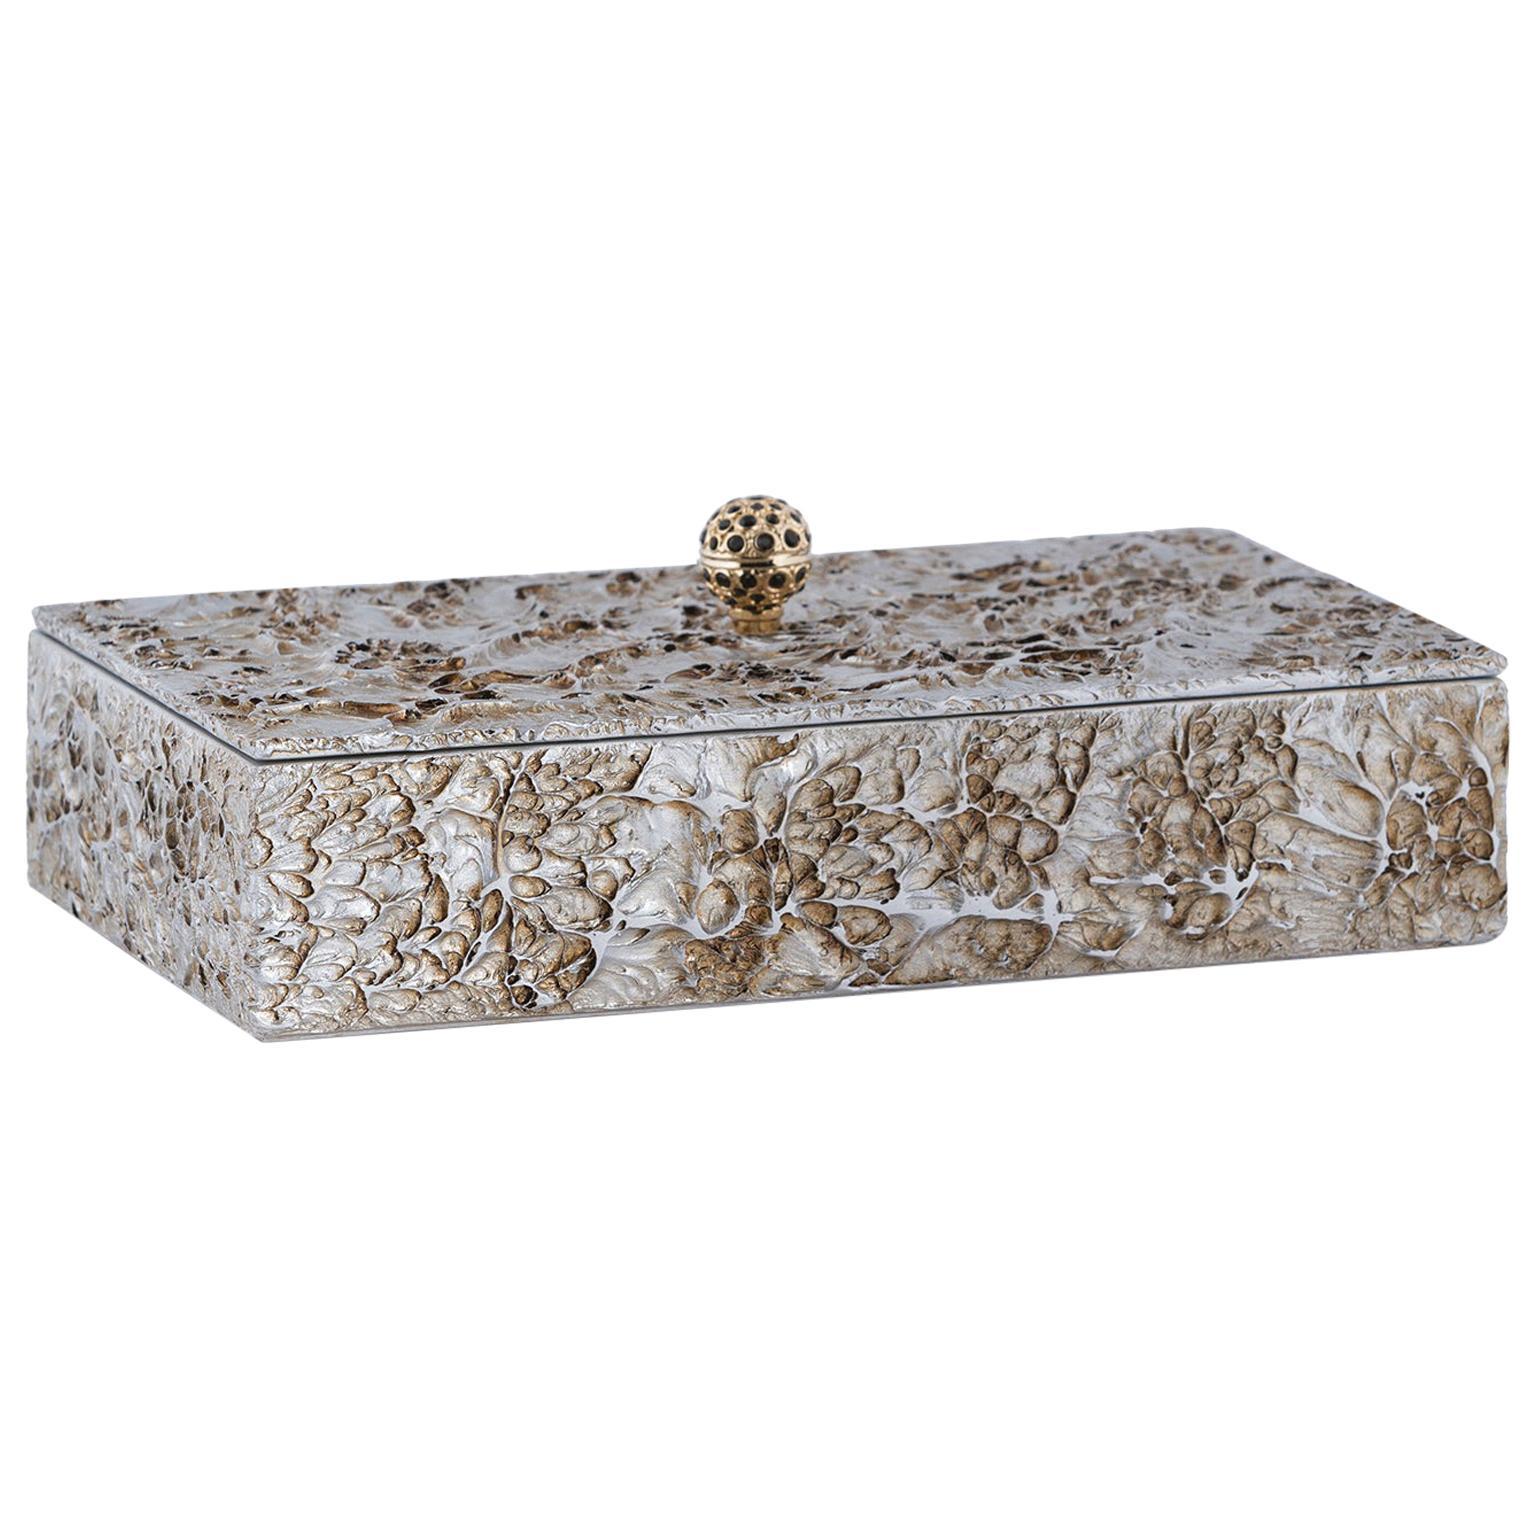 21st Century Madagascar M Wooden Decorative Box Handmade Texturized Effect